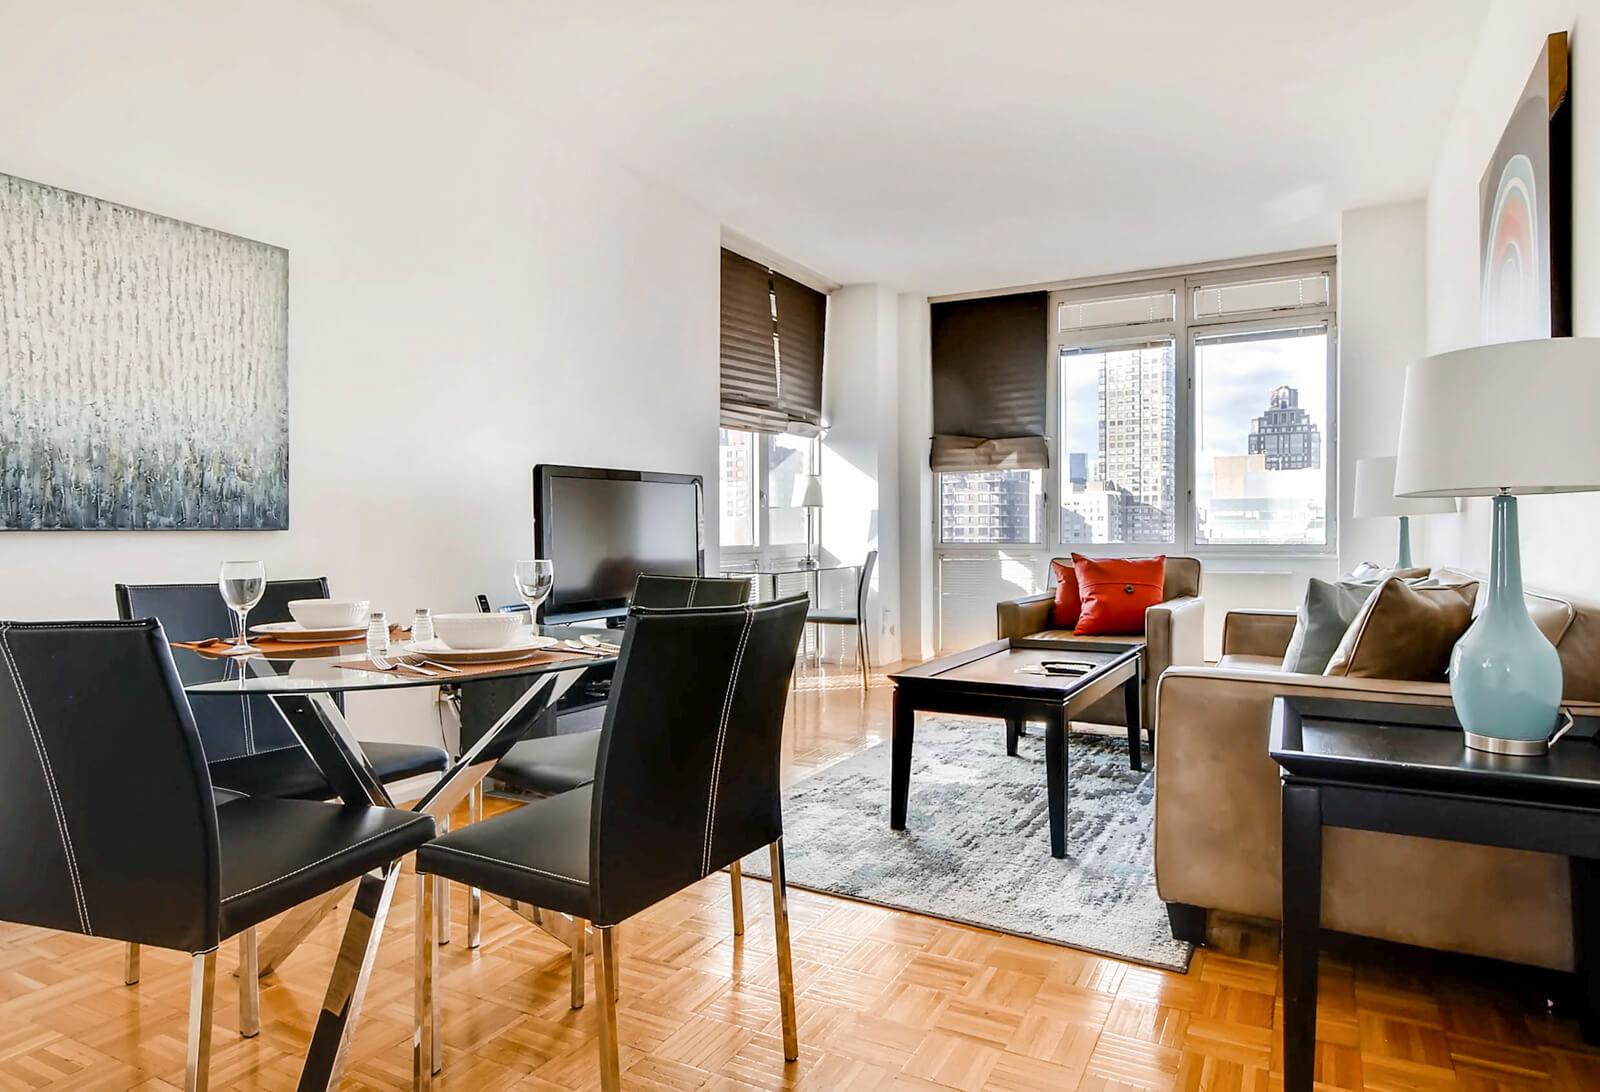 furnished 2 bedroom apartment for rent in upper east side manhattan